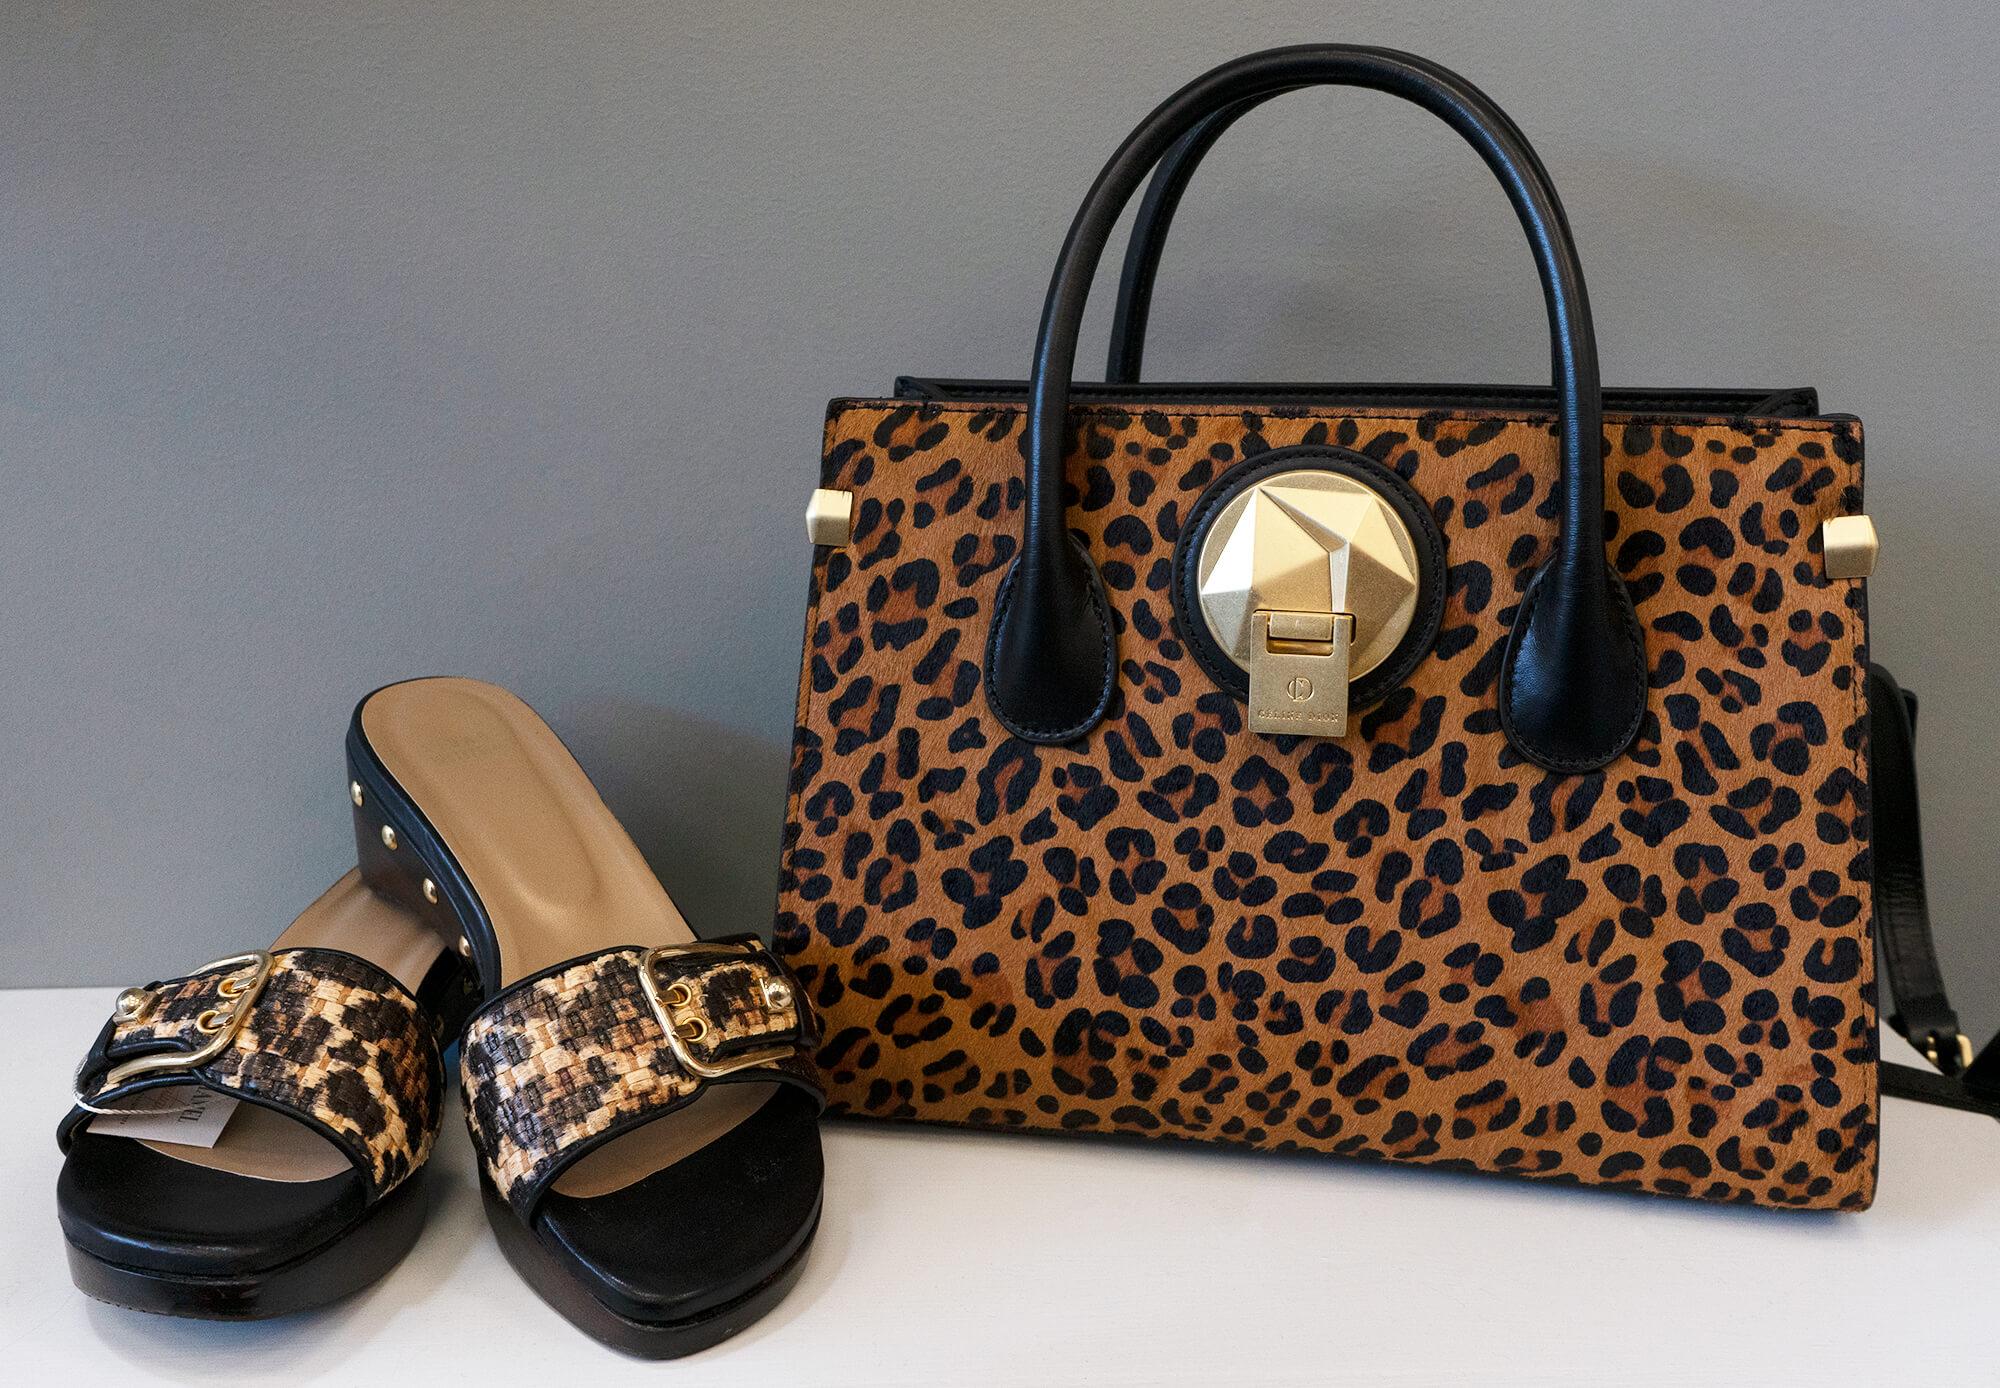 image of animal print accessories